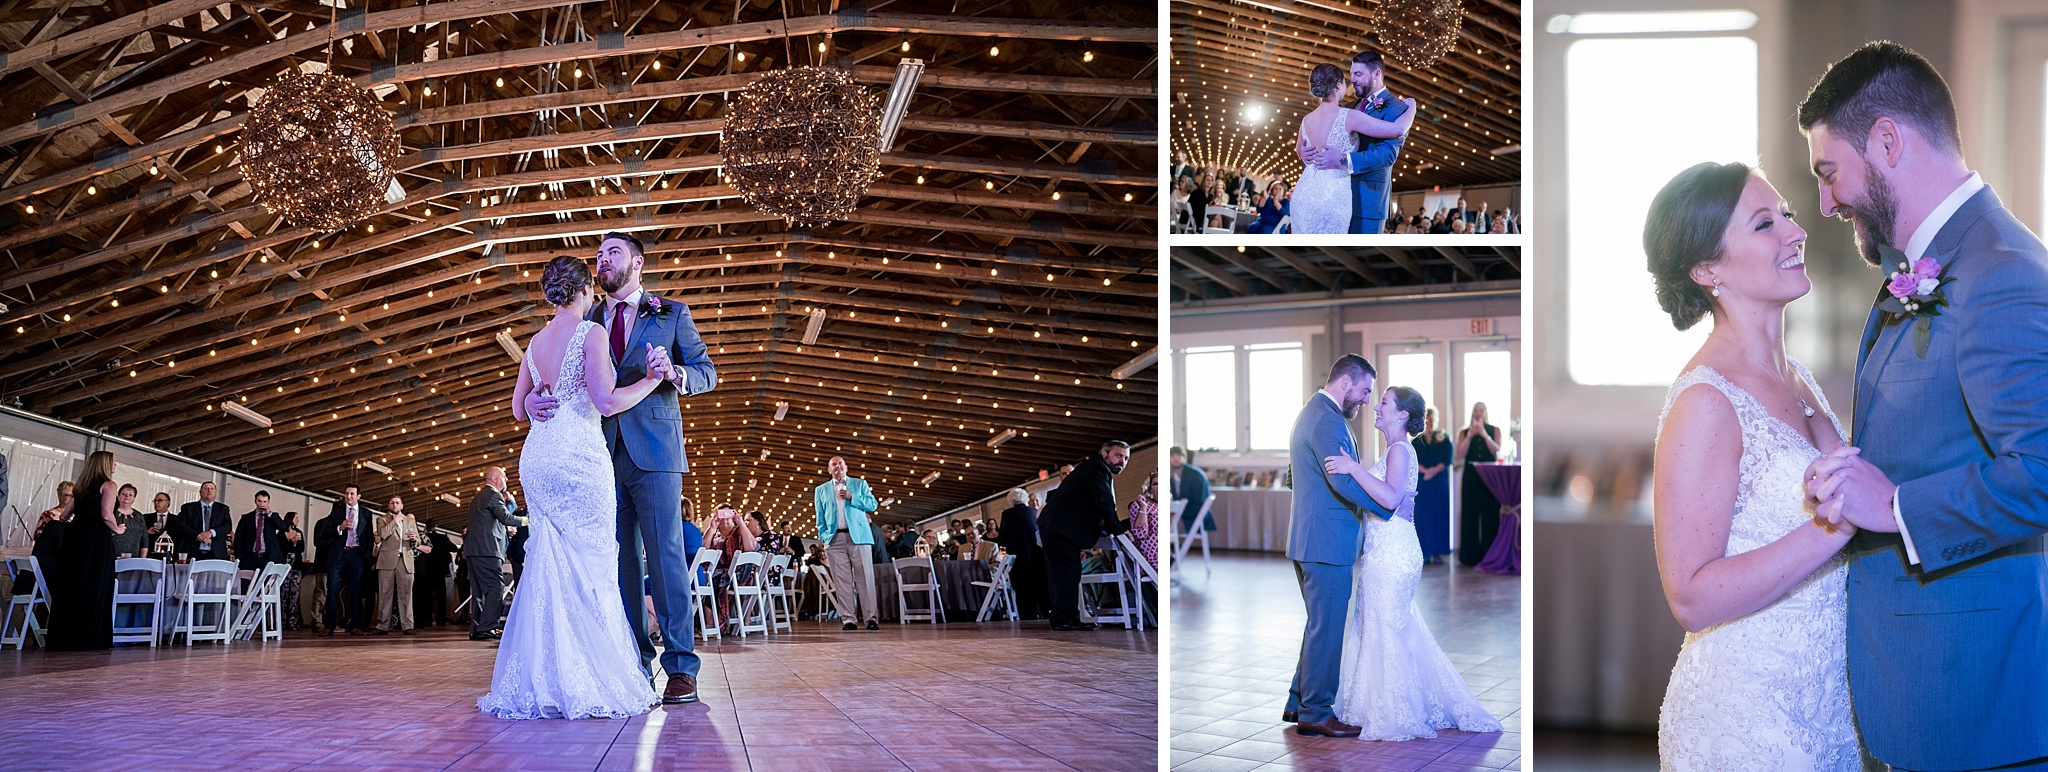 Manteo-NC-Wedding-Photographer-148.jpg